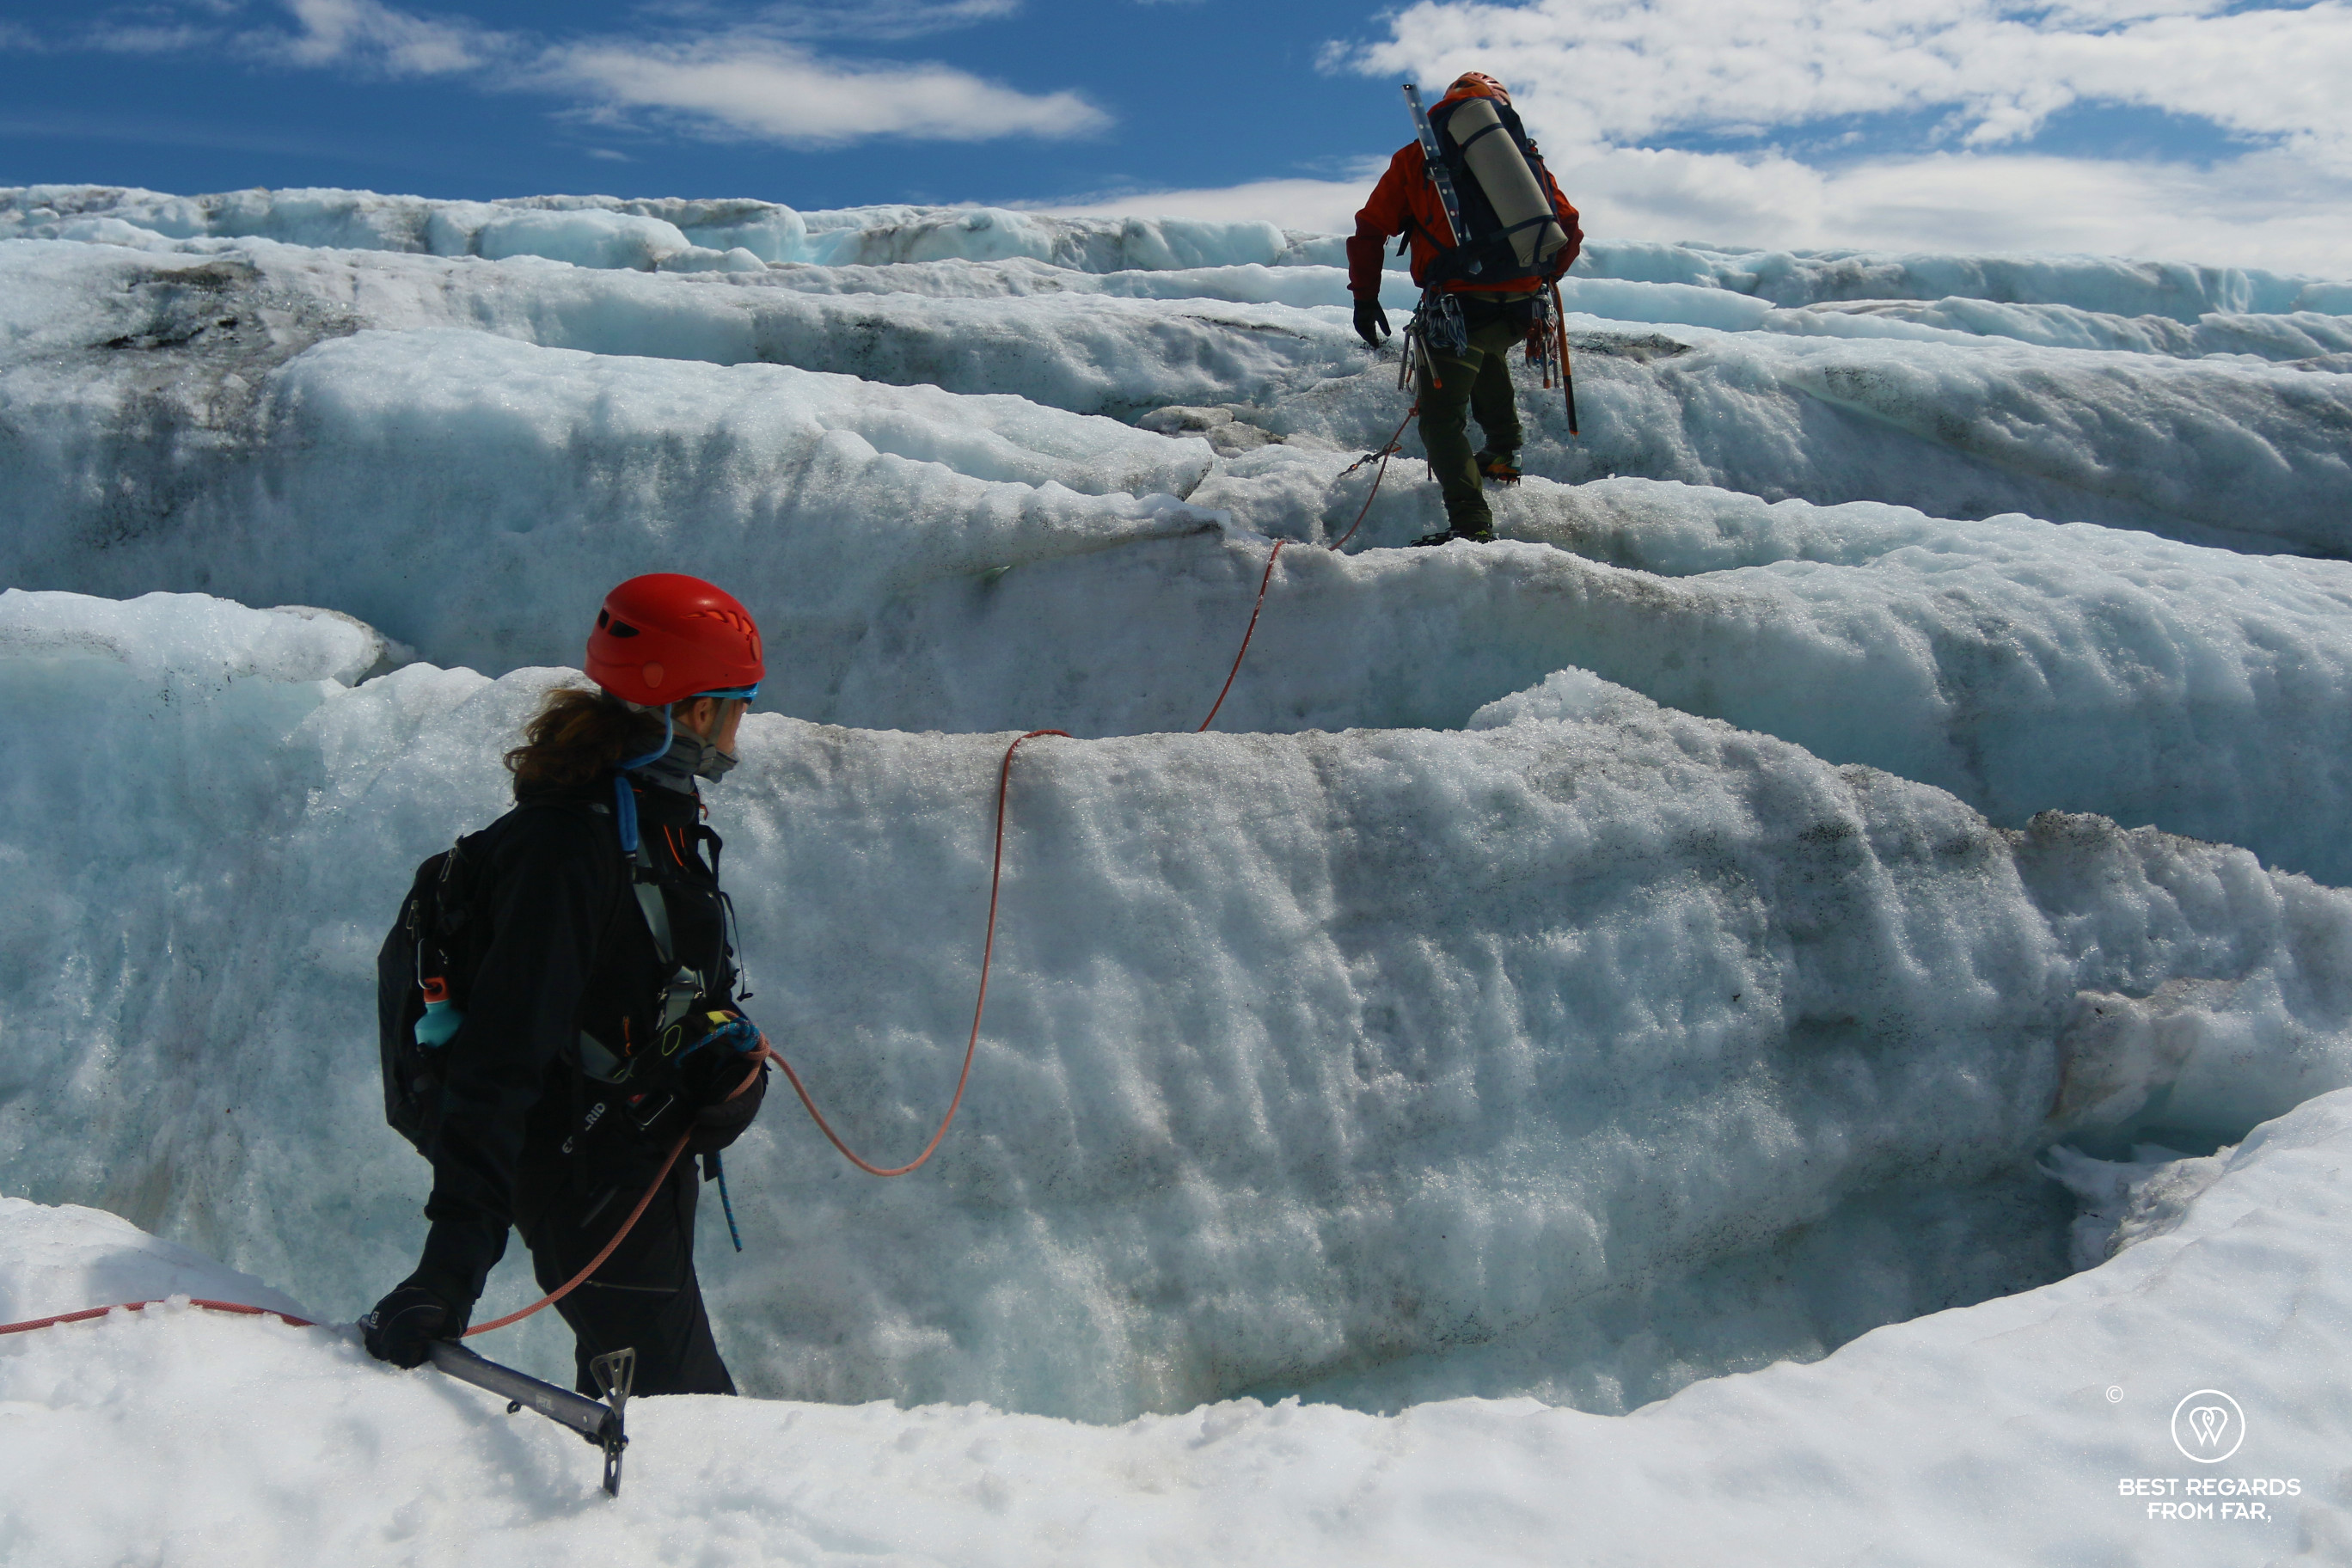 Author Marcella van Alphen progressing on the Fonna Glacier amongst crevasses